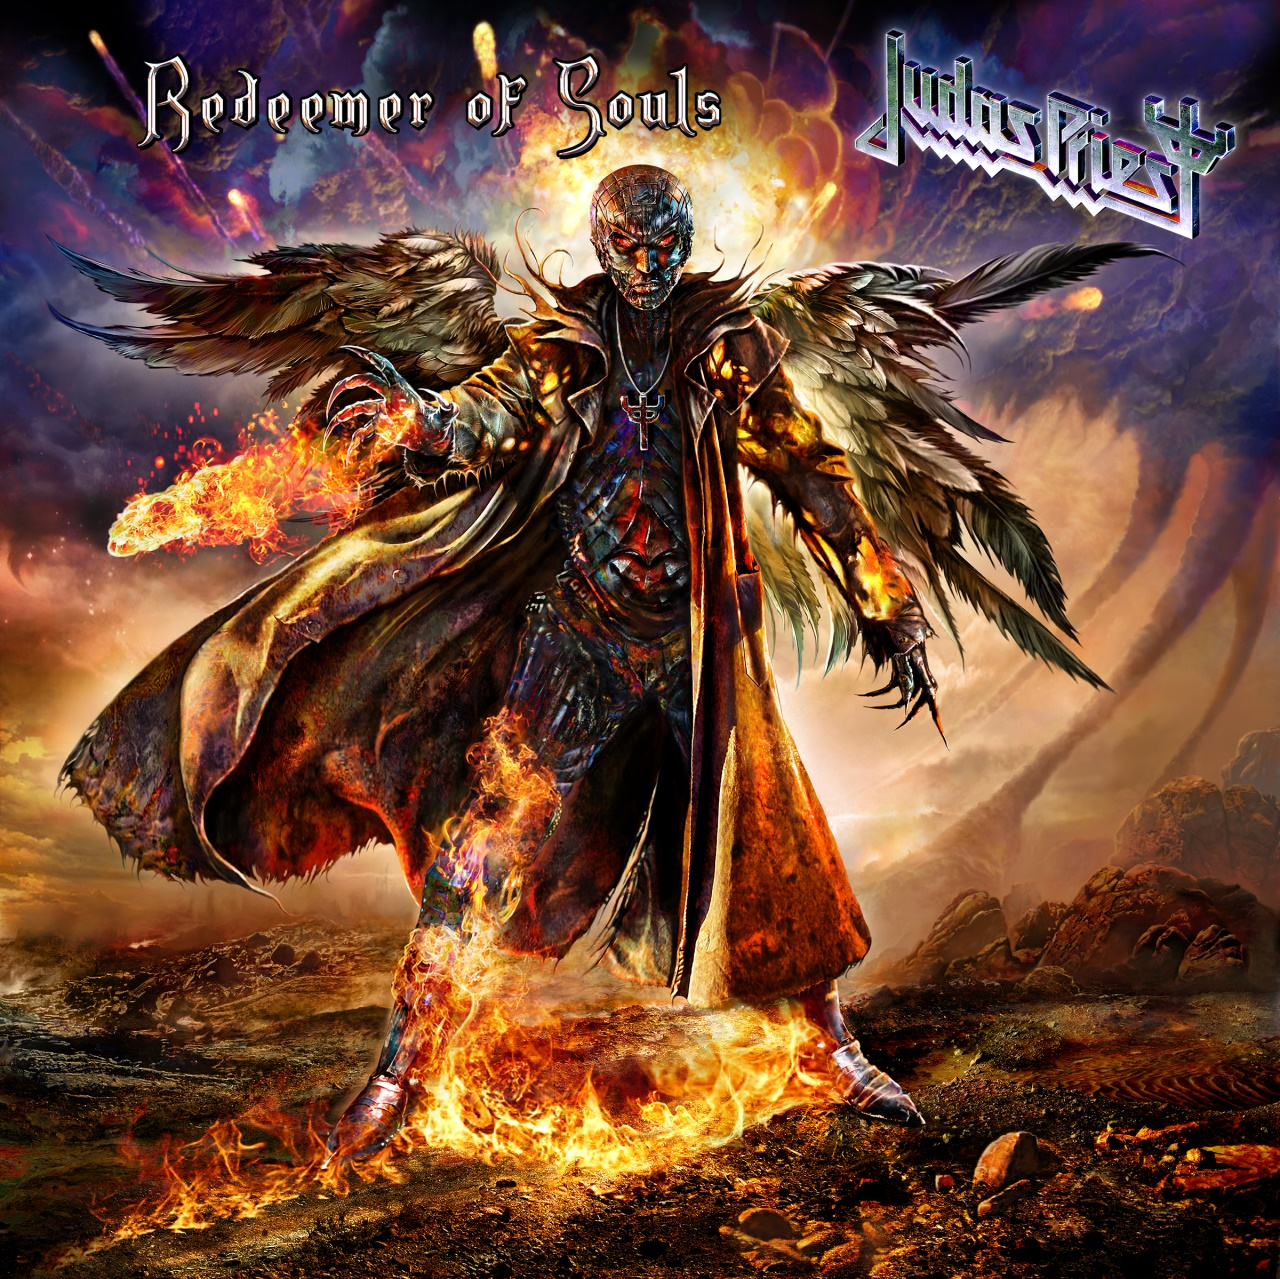 Weltfremd - Nachwelt Review | Angry Metal Guy